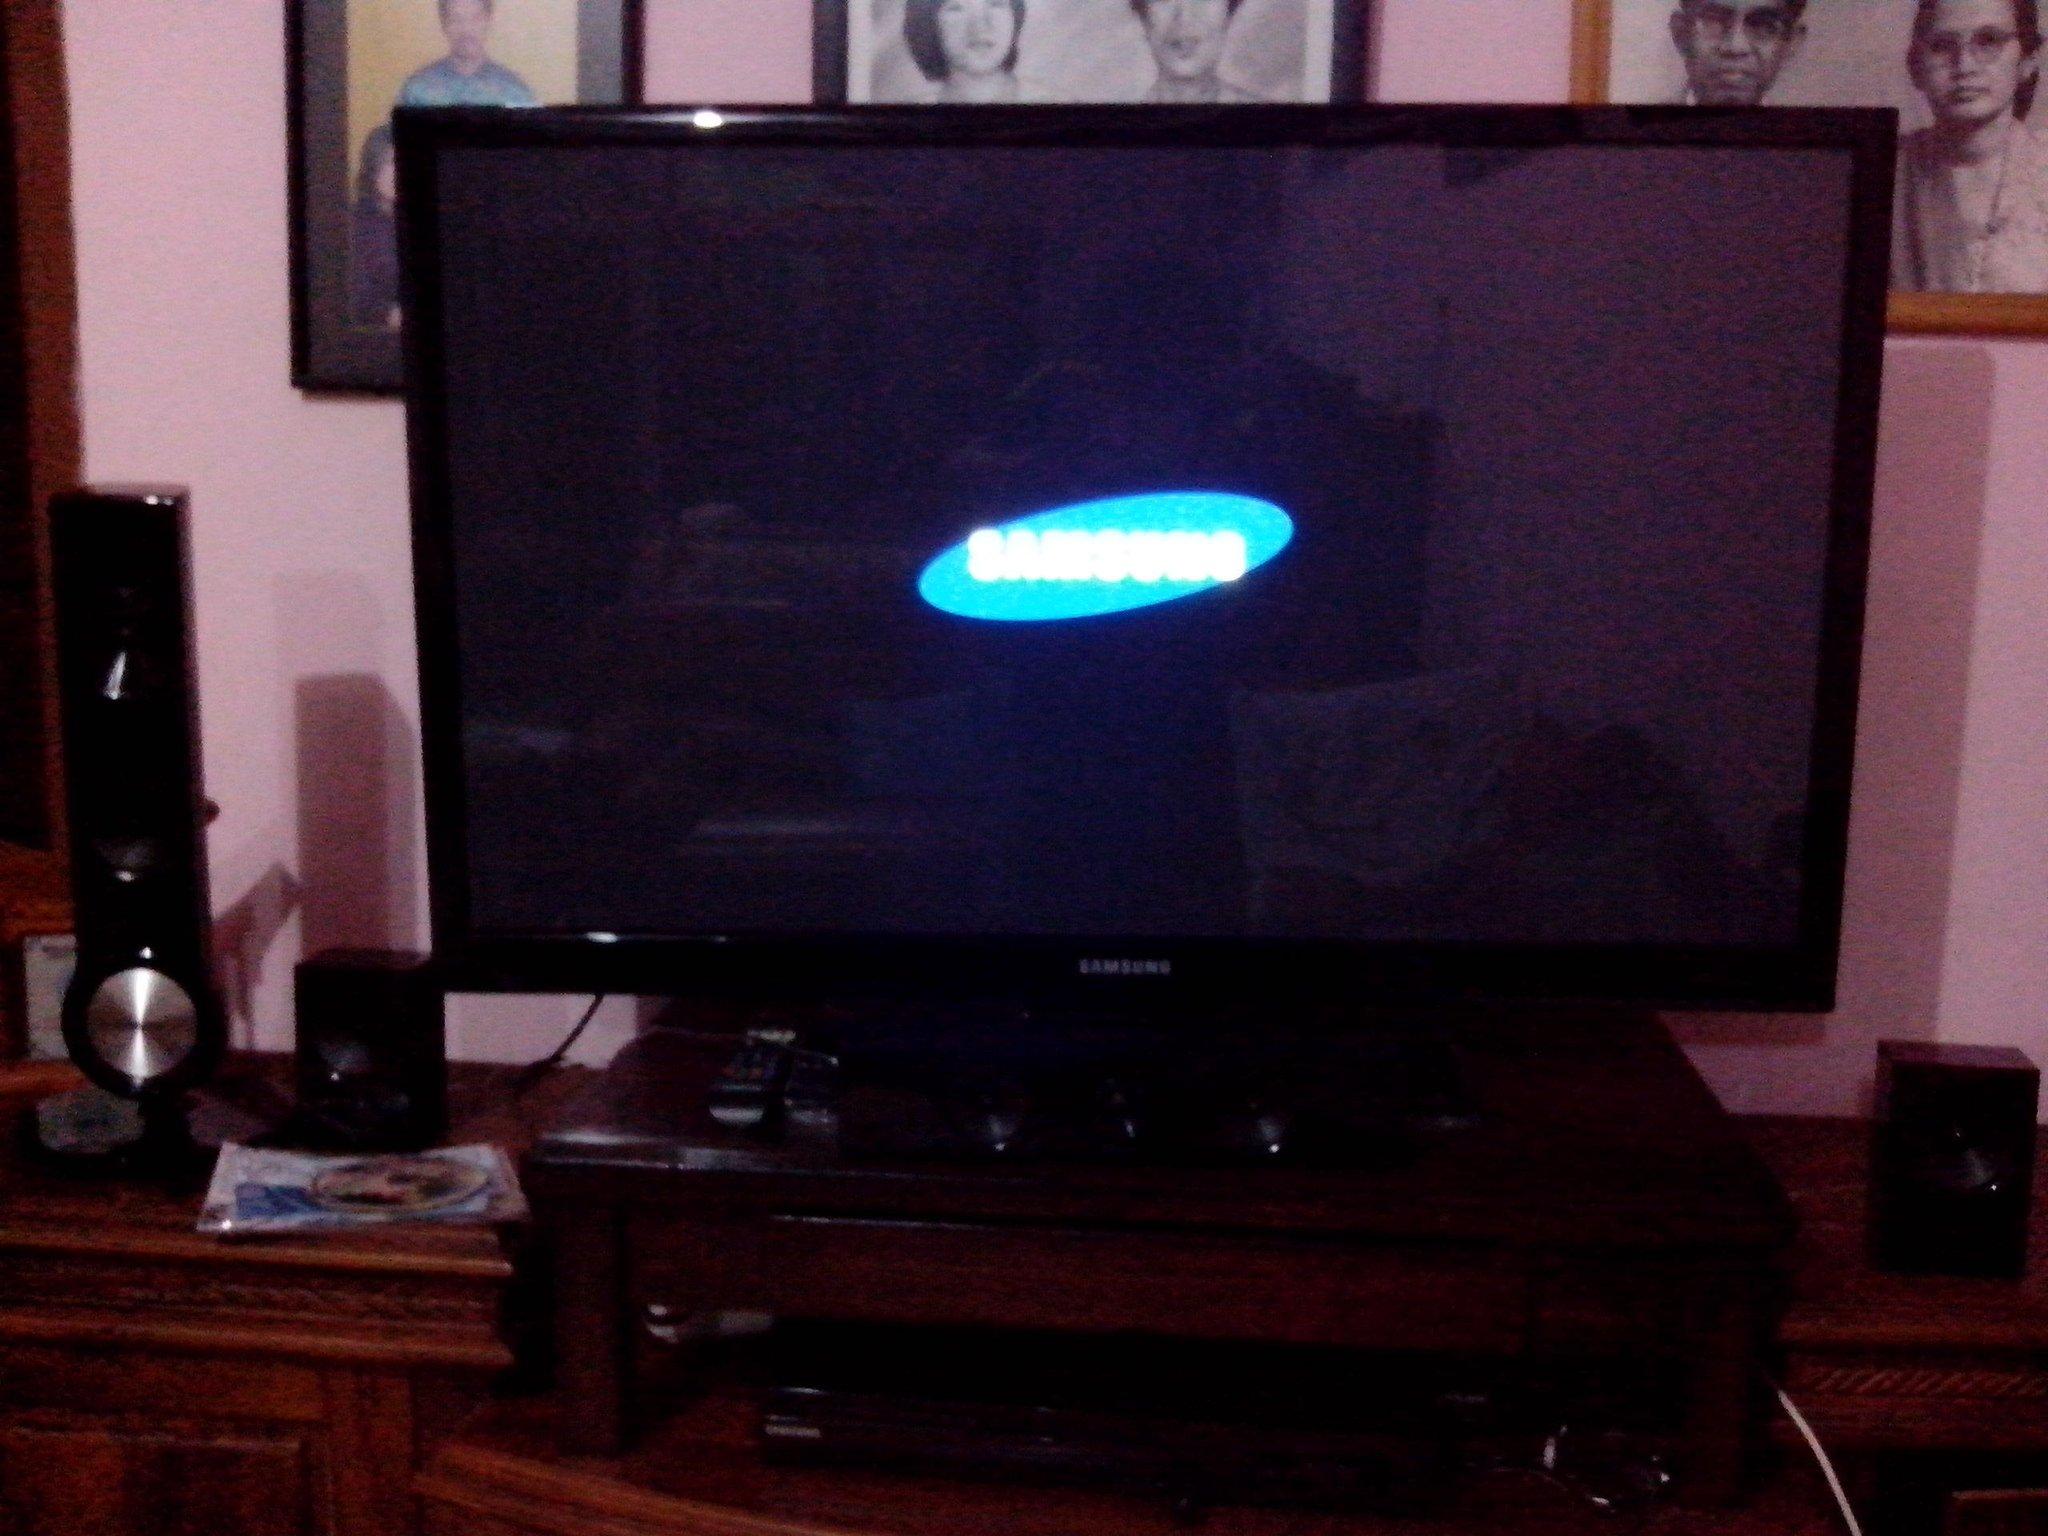 "wts samsung plasma tv 43"" [bandung]"